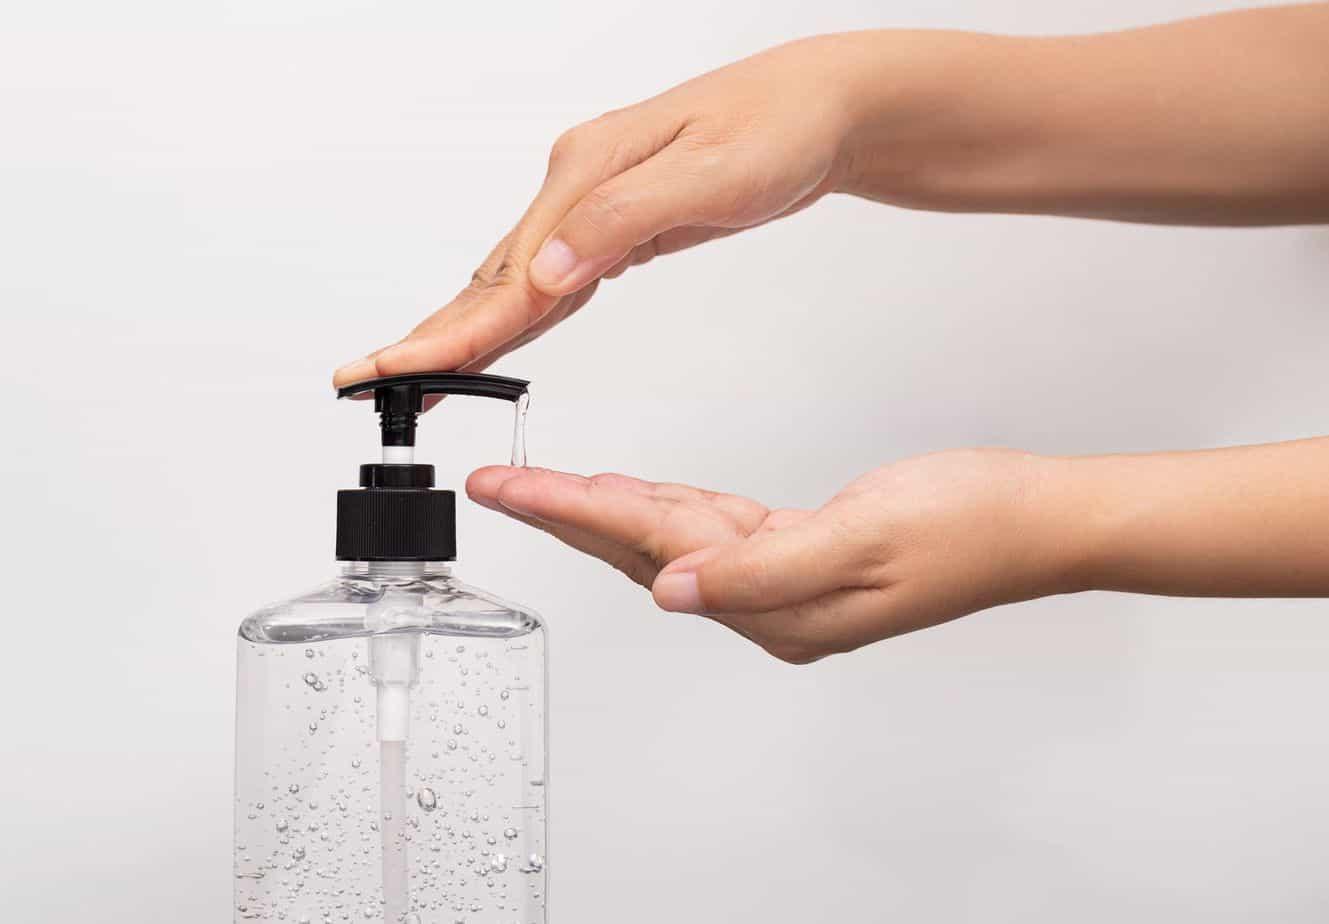 Hand Sanitizer Use